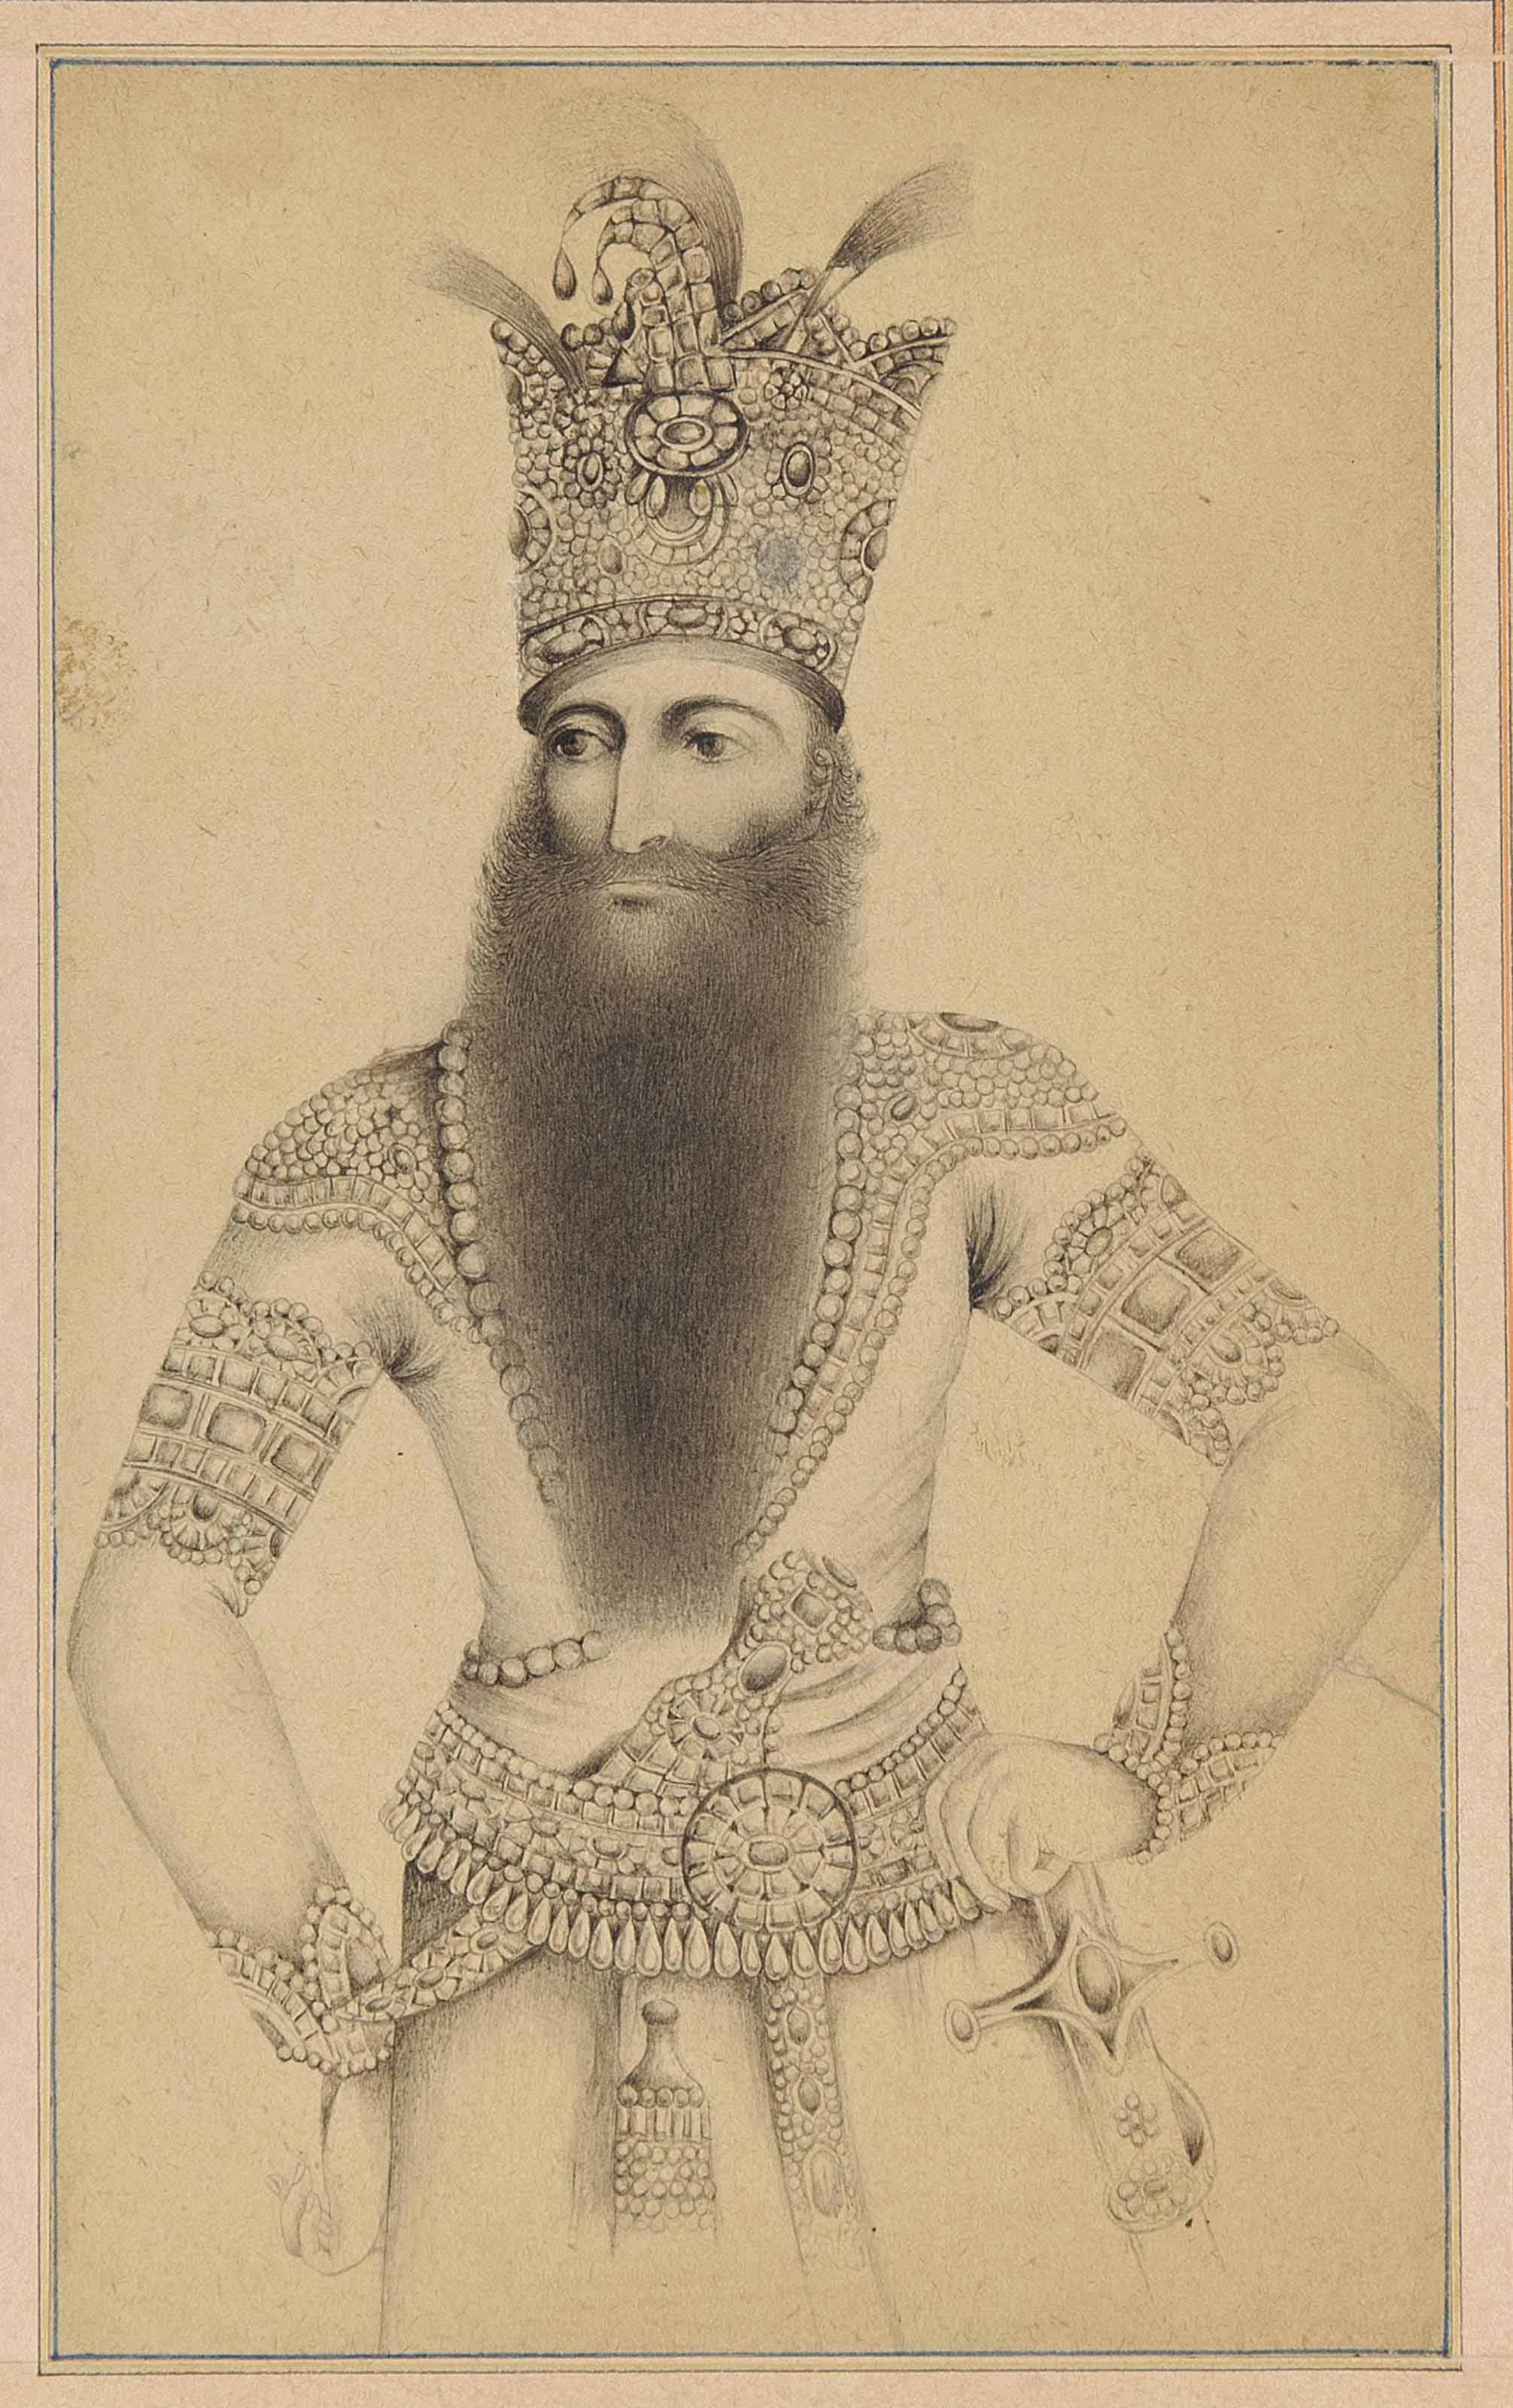 A PORTRAIT OF FATH 'ALI SHAH